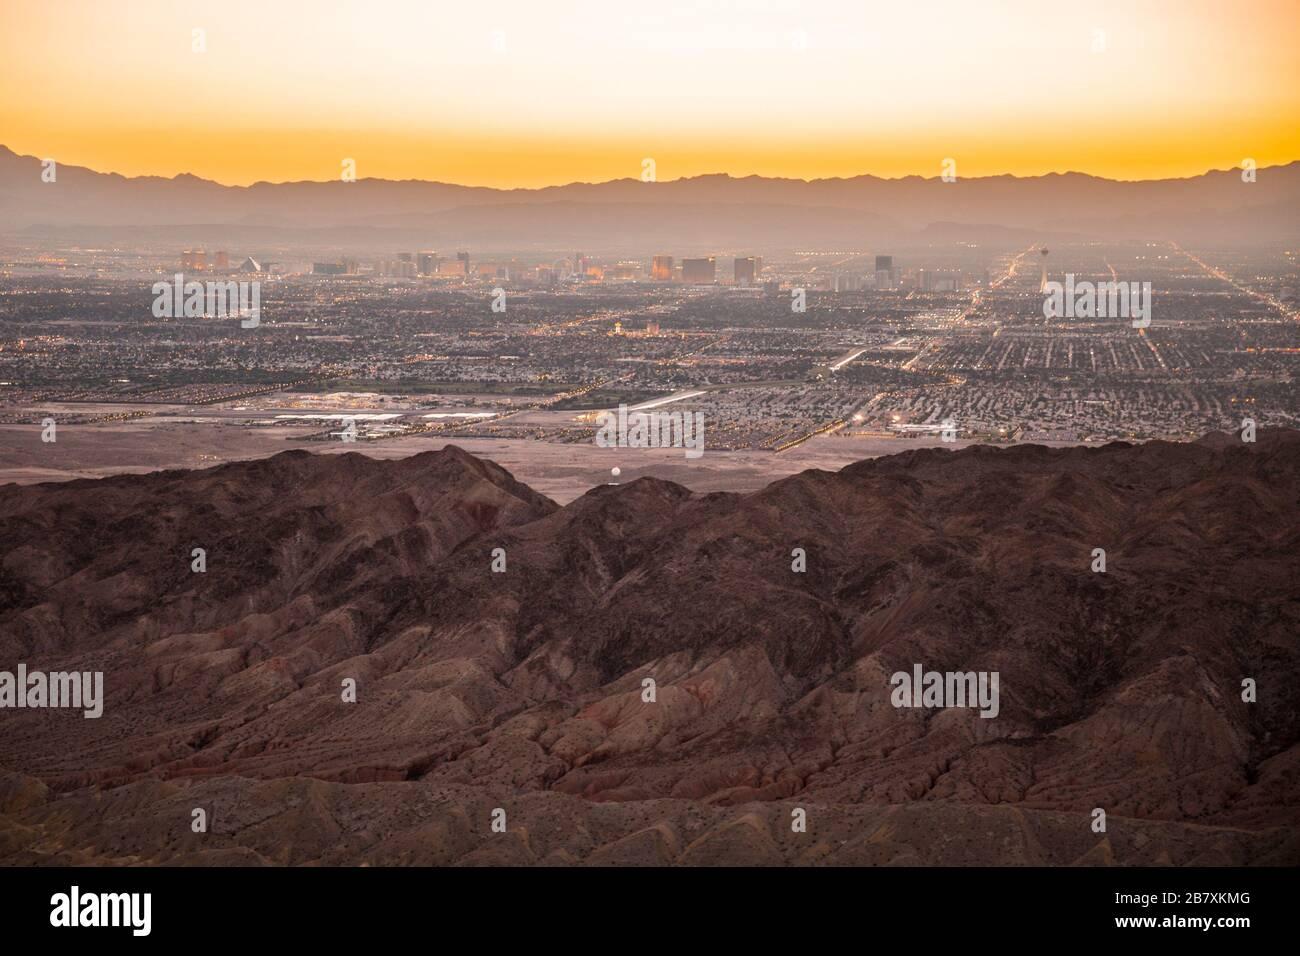 Views of Las Vegas, USA and the surrounding area. Credit: Charlie Raven/Alamy Stock Photo